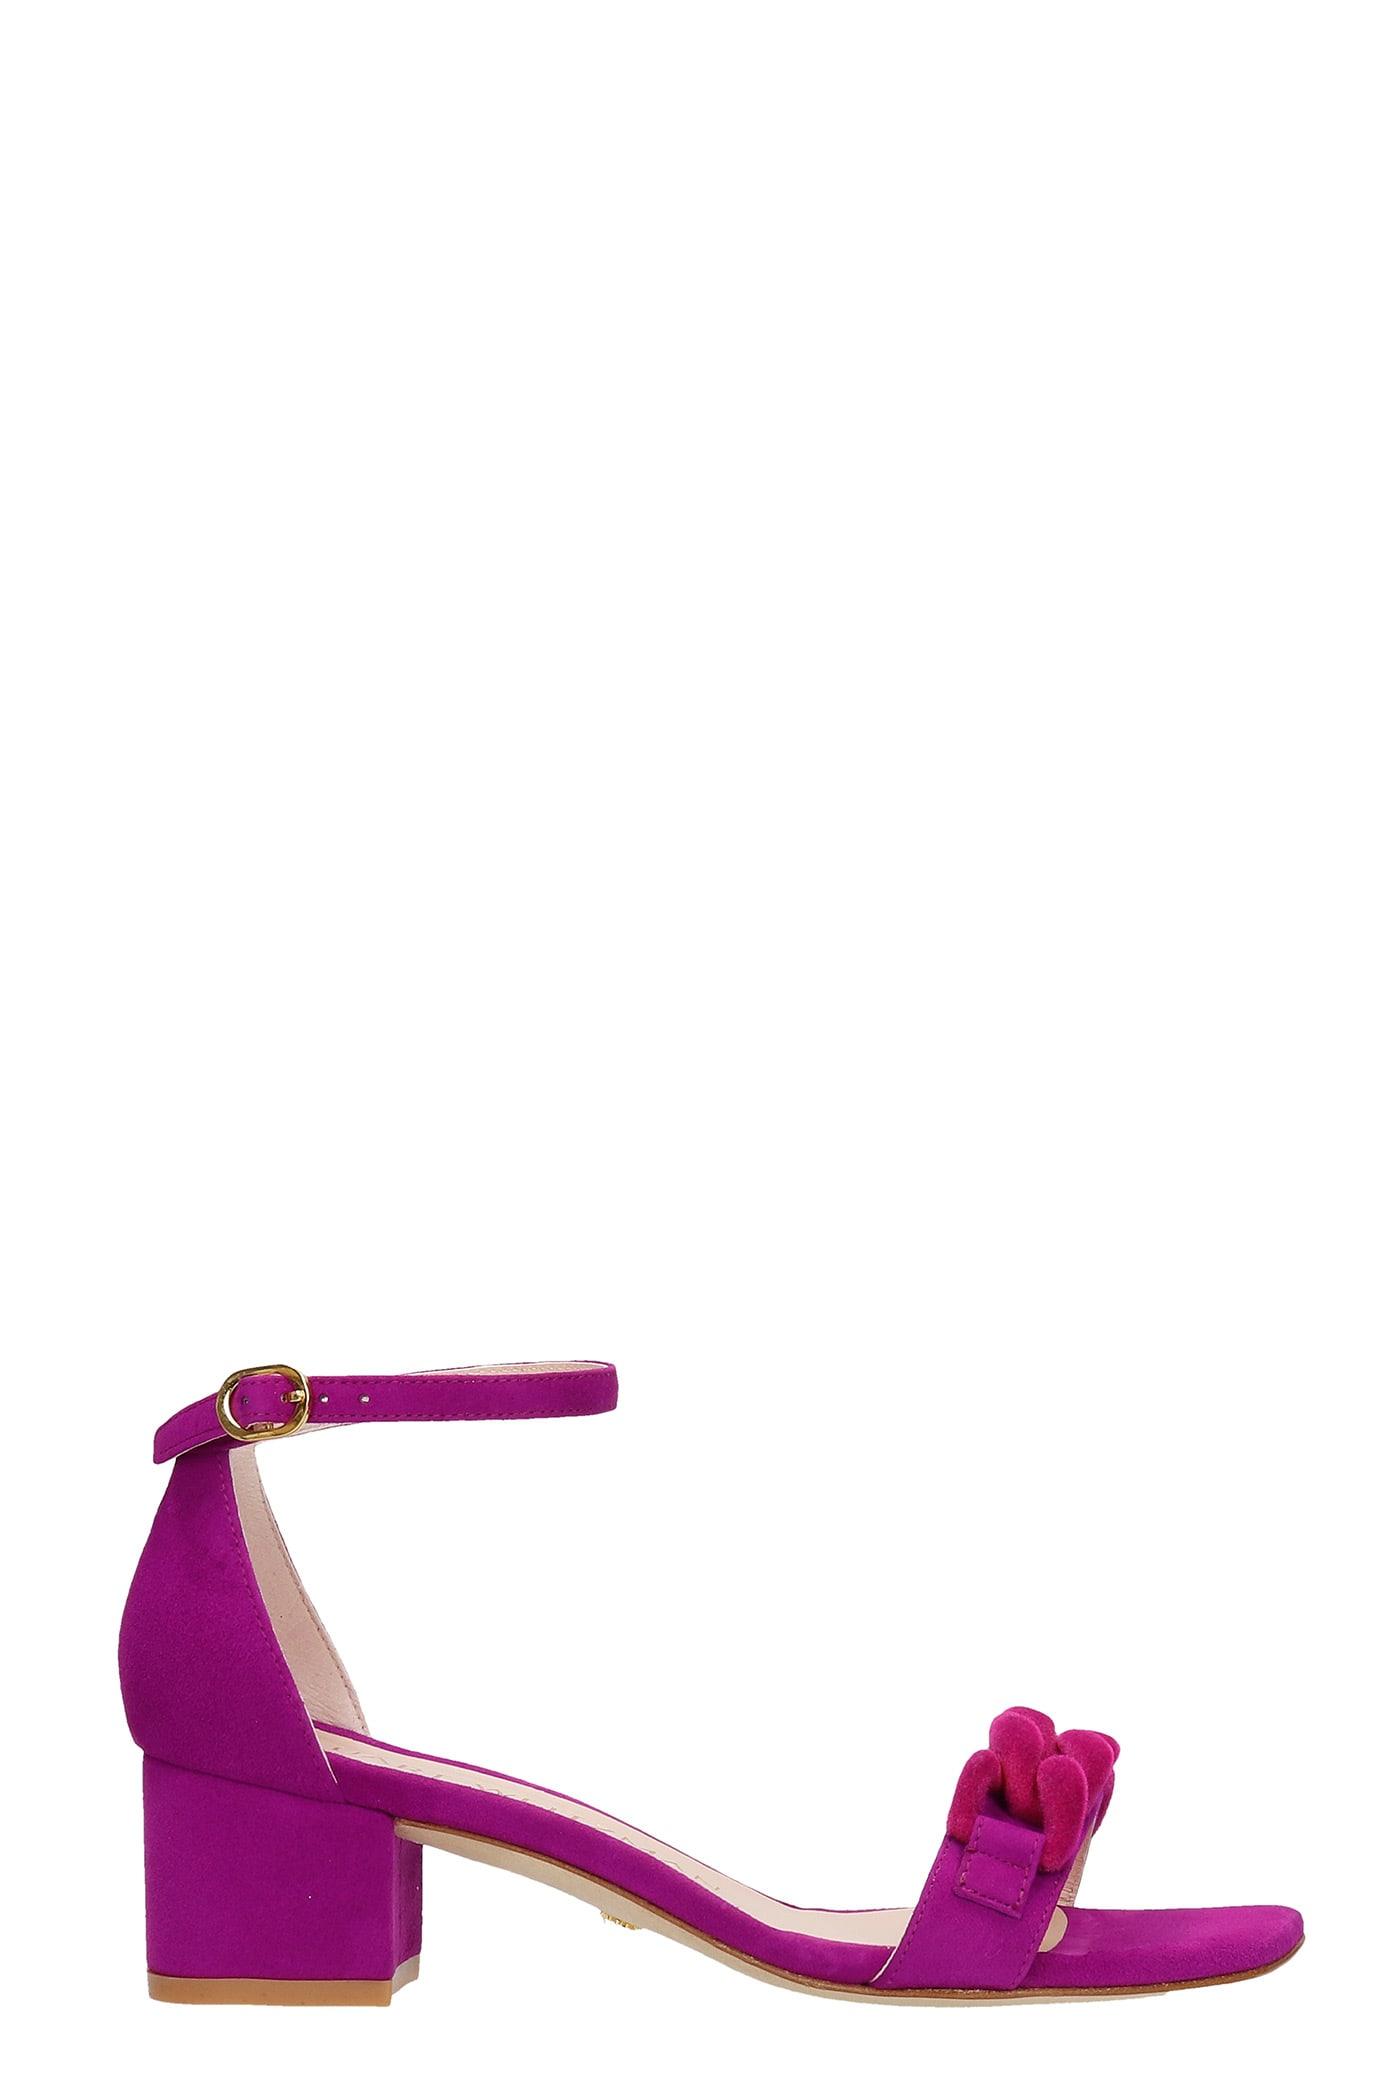 Buy Stuart Weitzman Amelina 50 Sandals In Viola Suede online, shop Stuart Weitzman shoes with free shipping